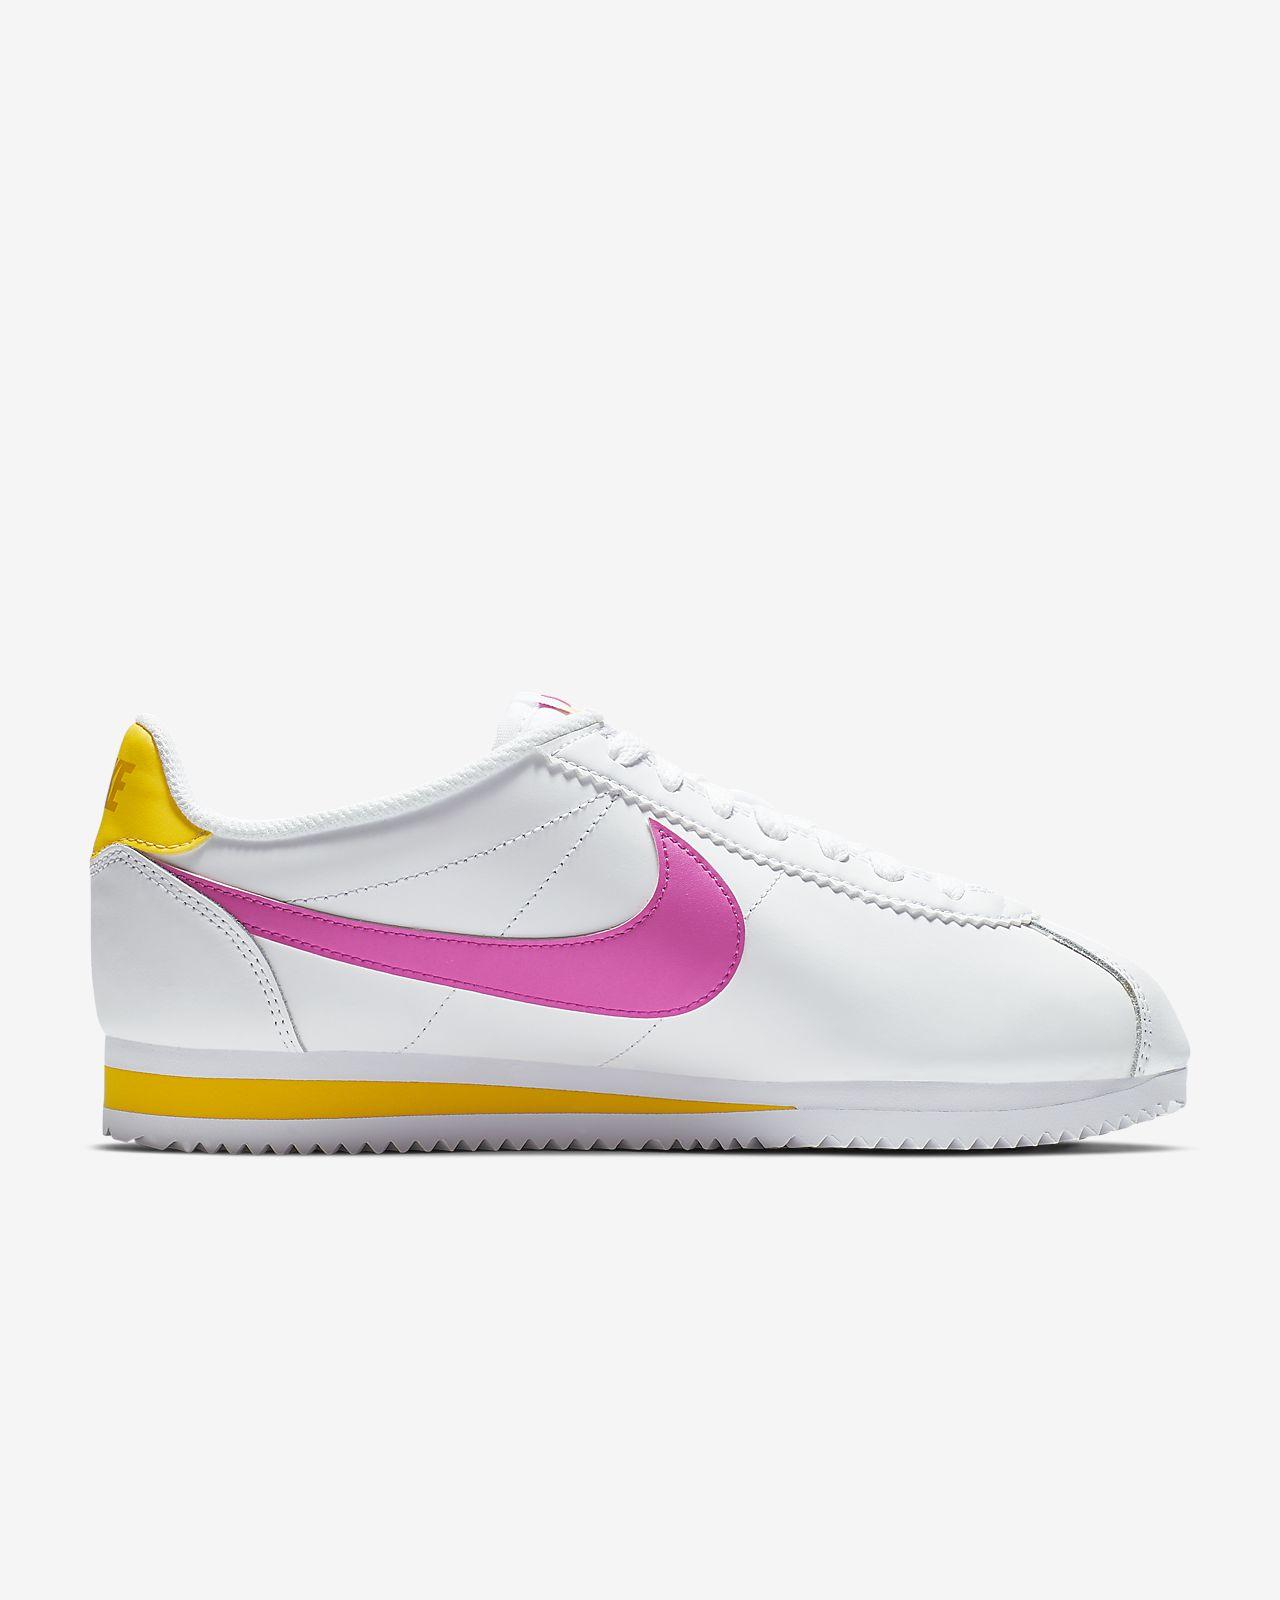 new concept 74f86 51ba9 ... Nike Classic Cortez Women s Shoe